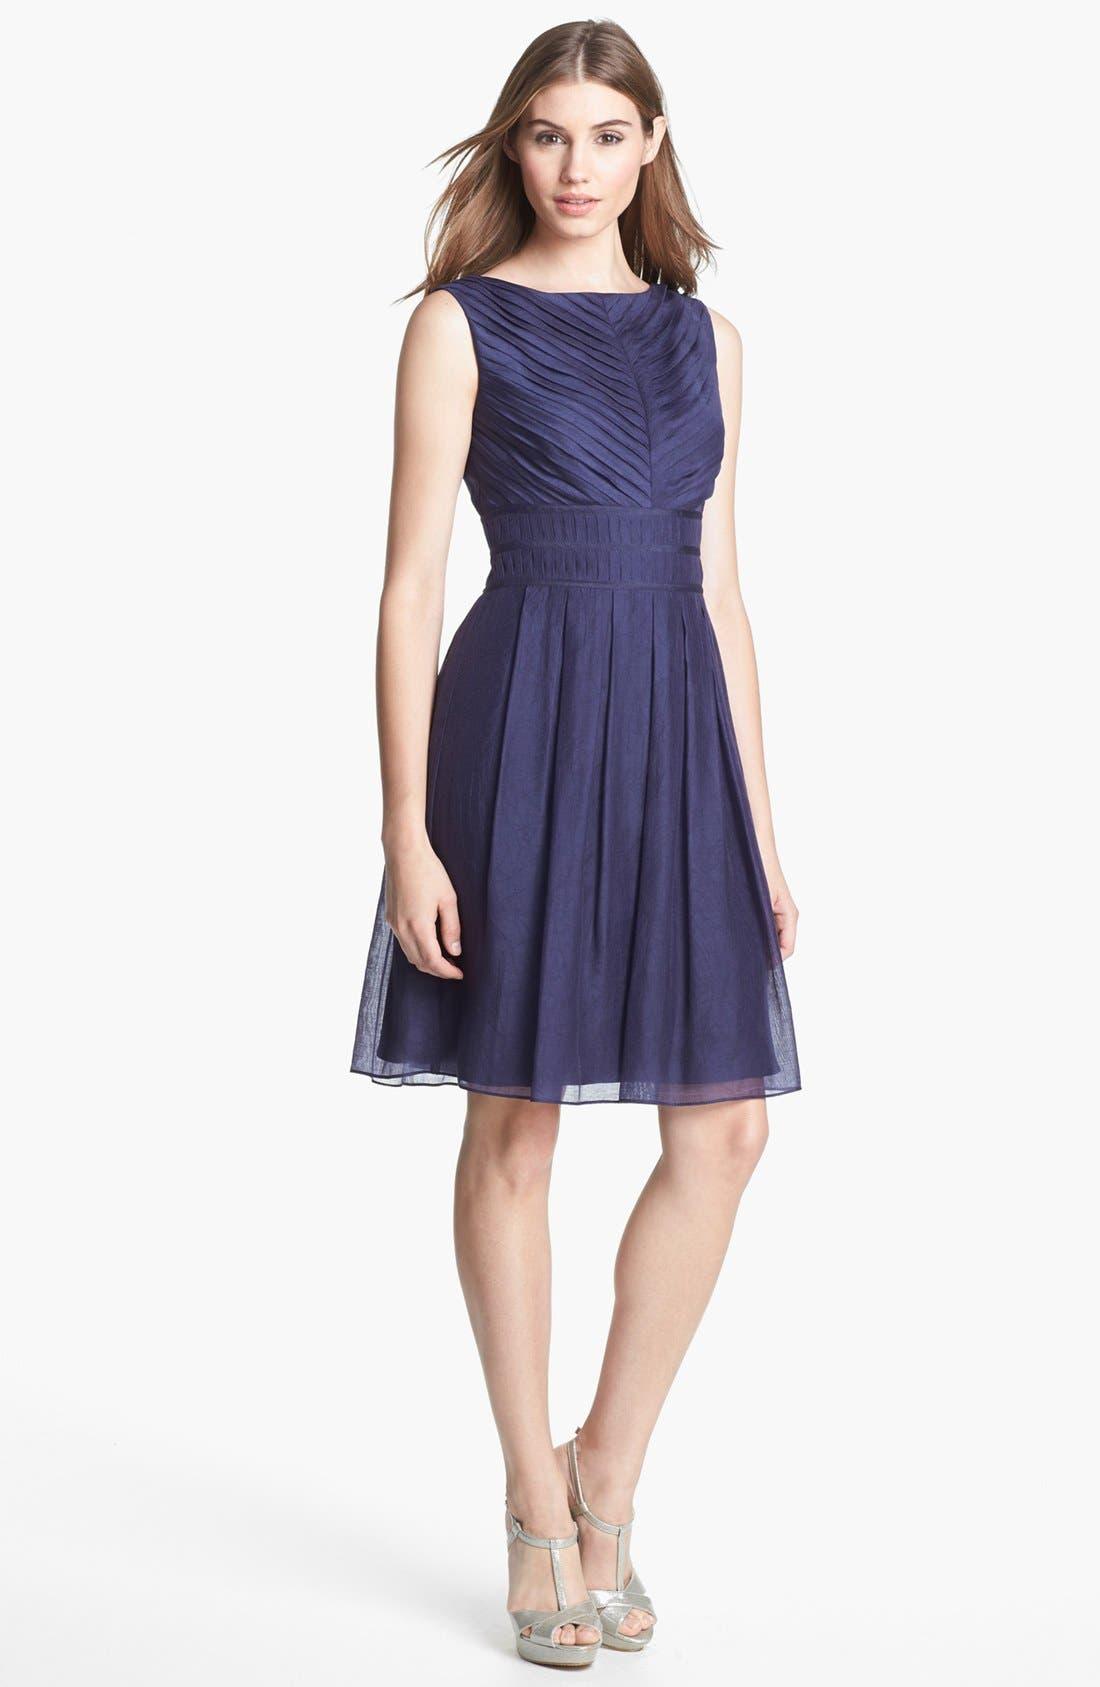 Main Image - Ivy & Blu Crinkled Pleat Fit & Flare Dress